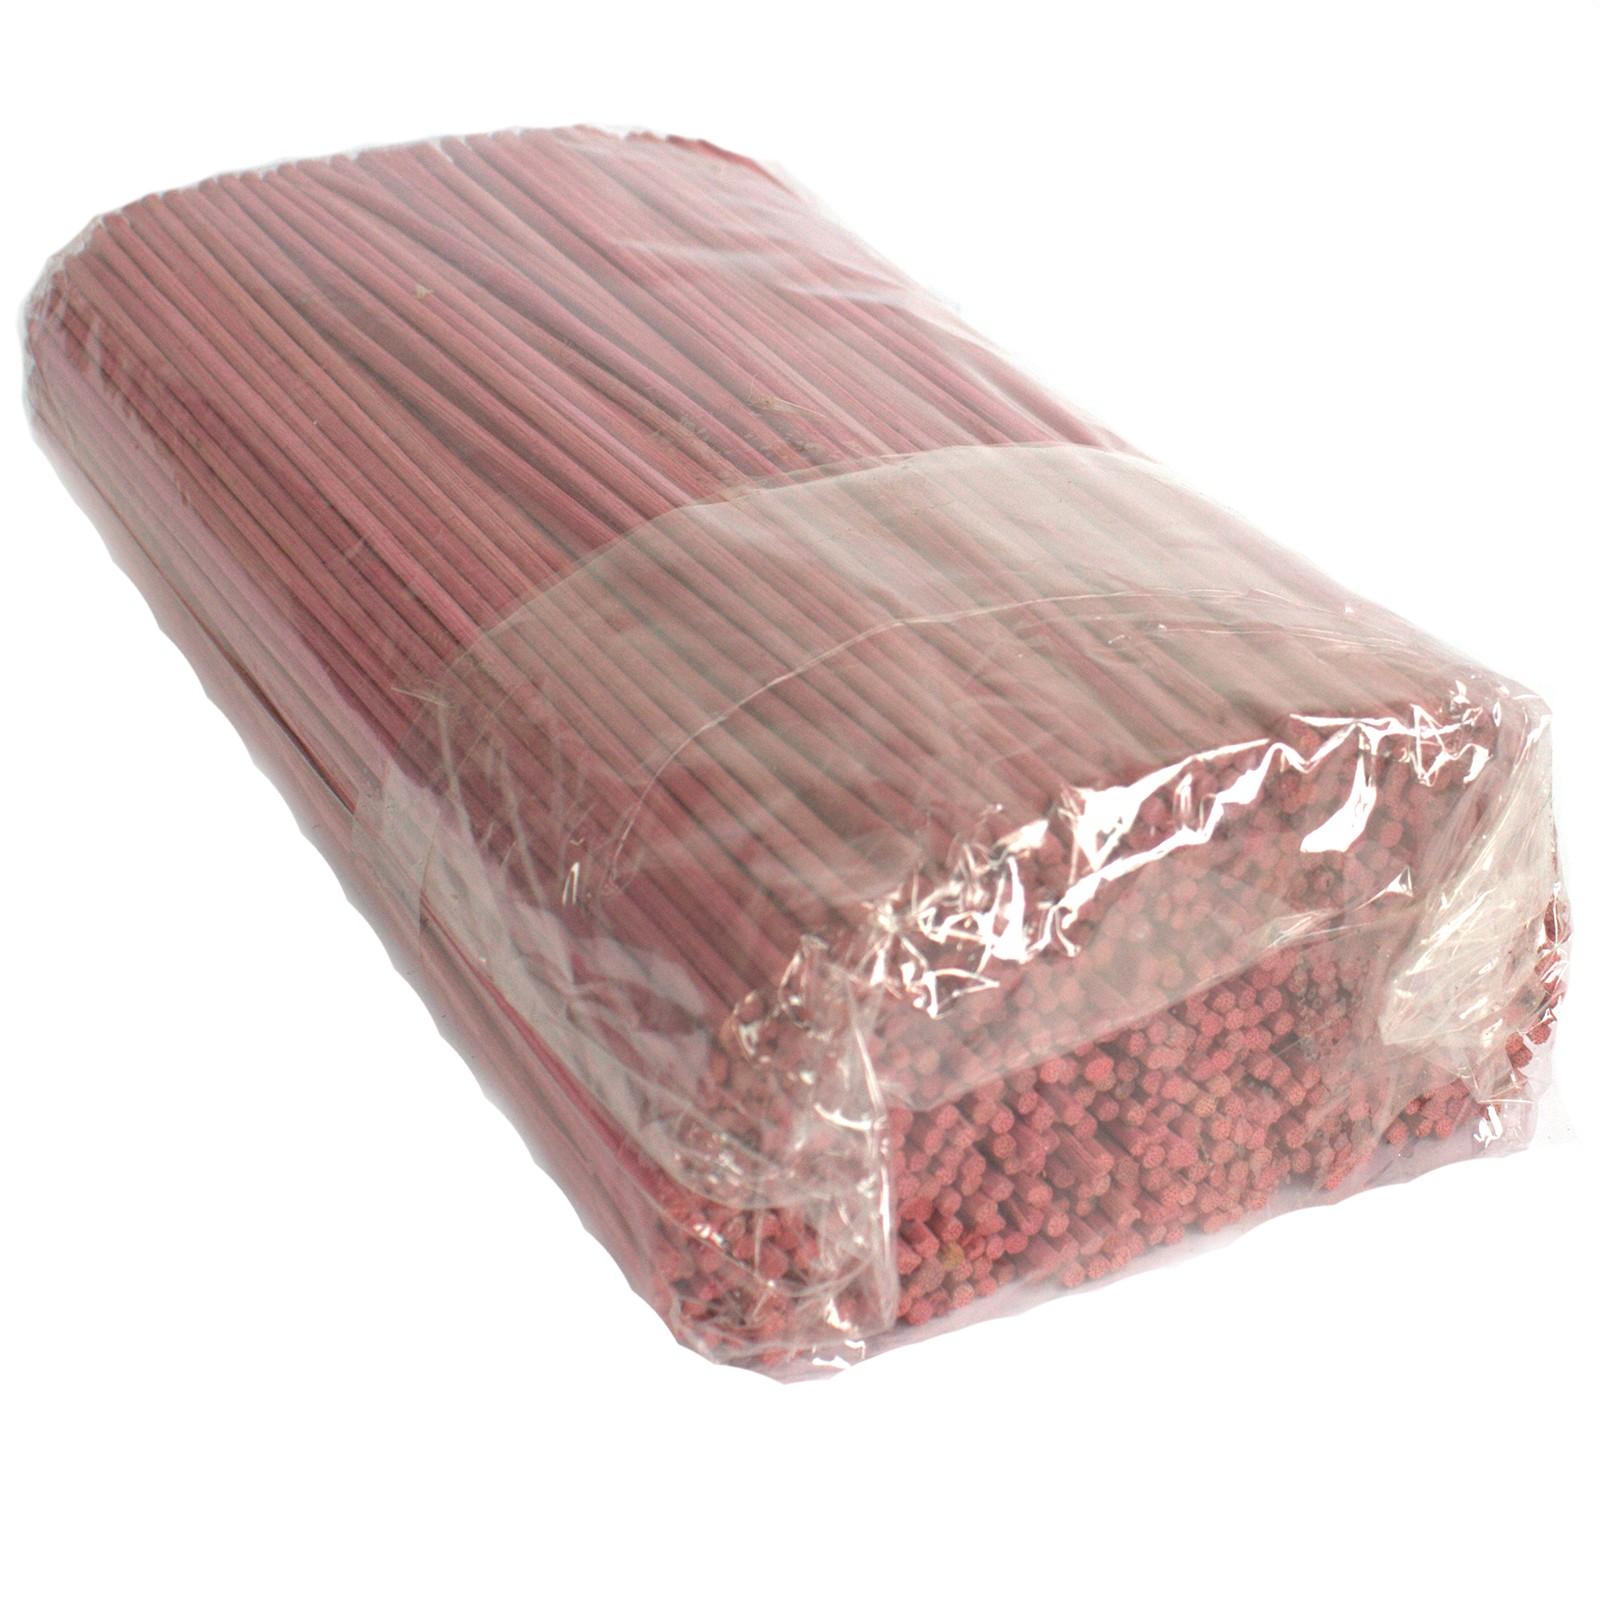 Pink Reed Diffuser Sticks 25cm x 3mm 500gms